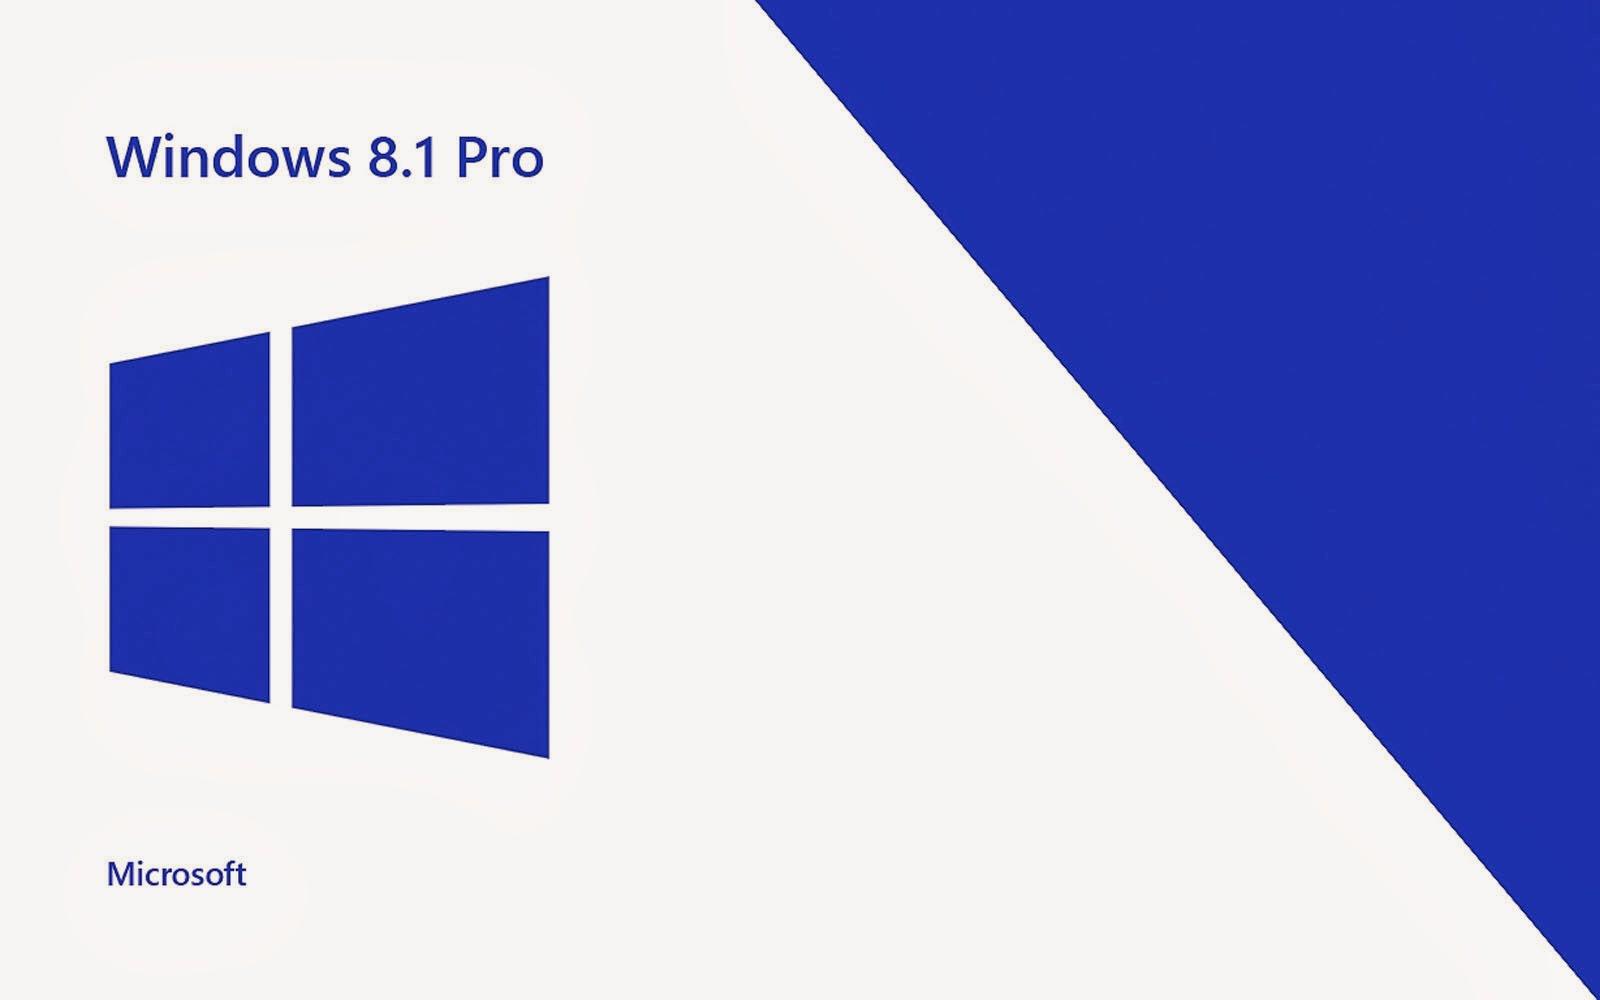 wallpapers: Windows 8.1 Wallpapers